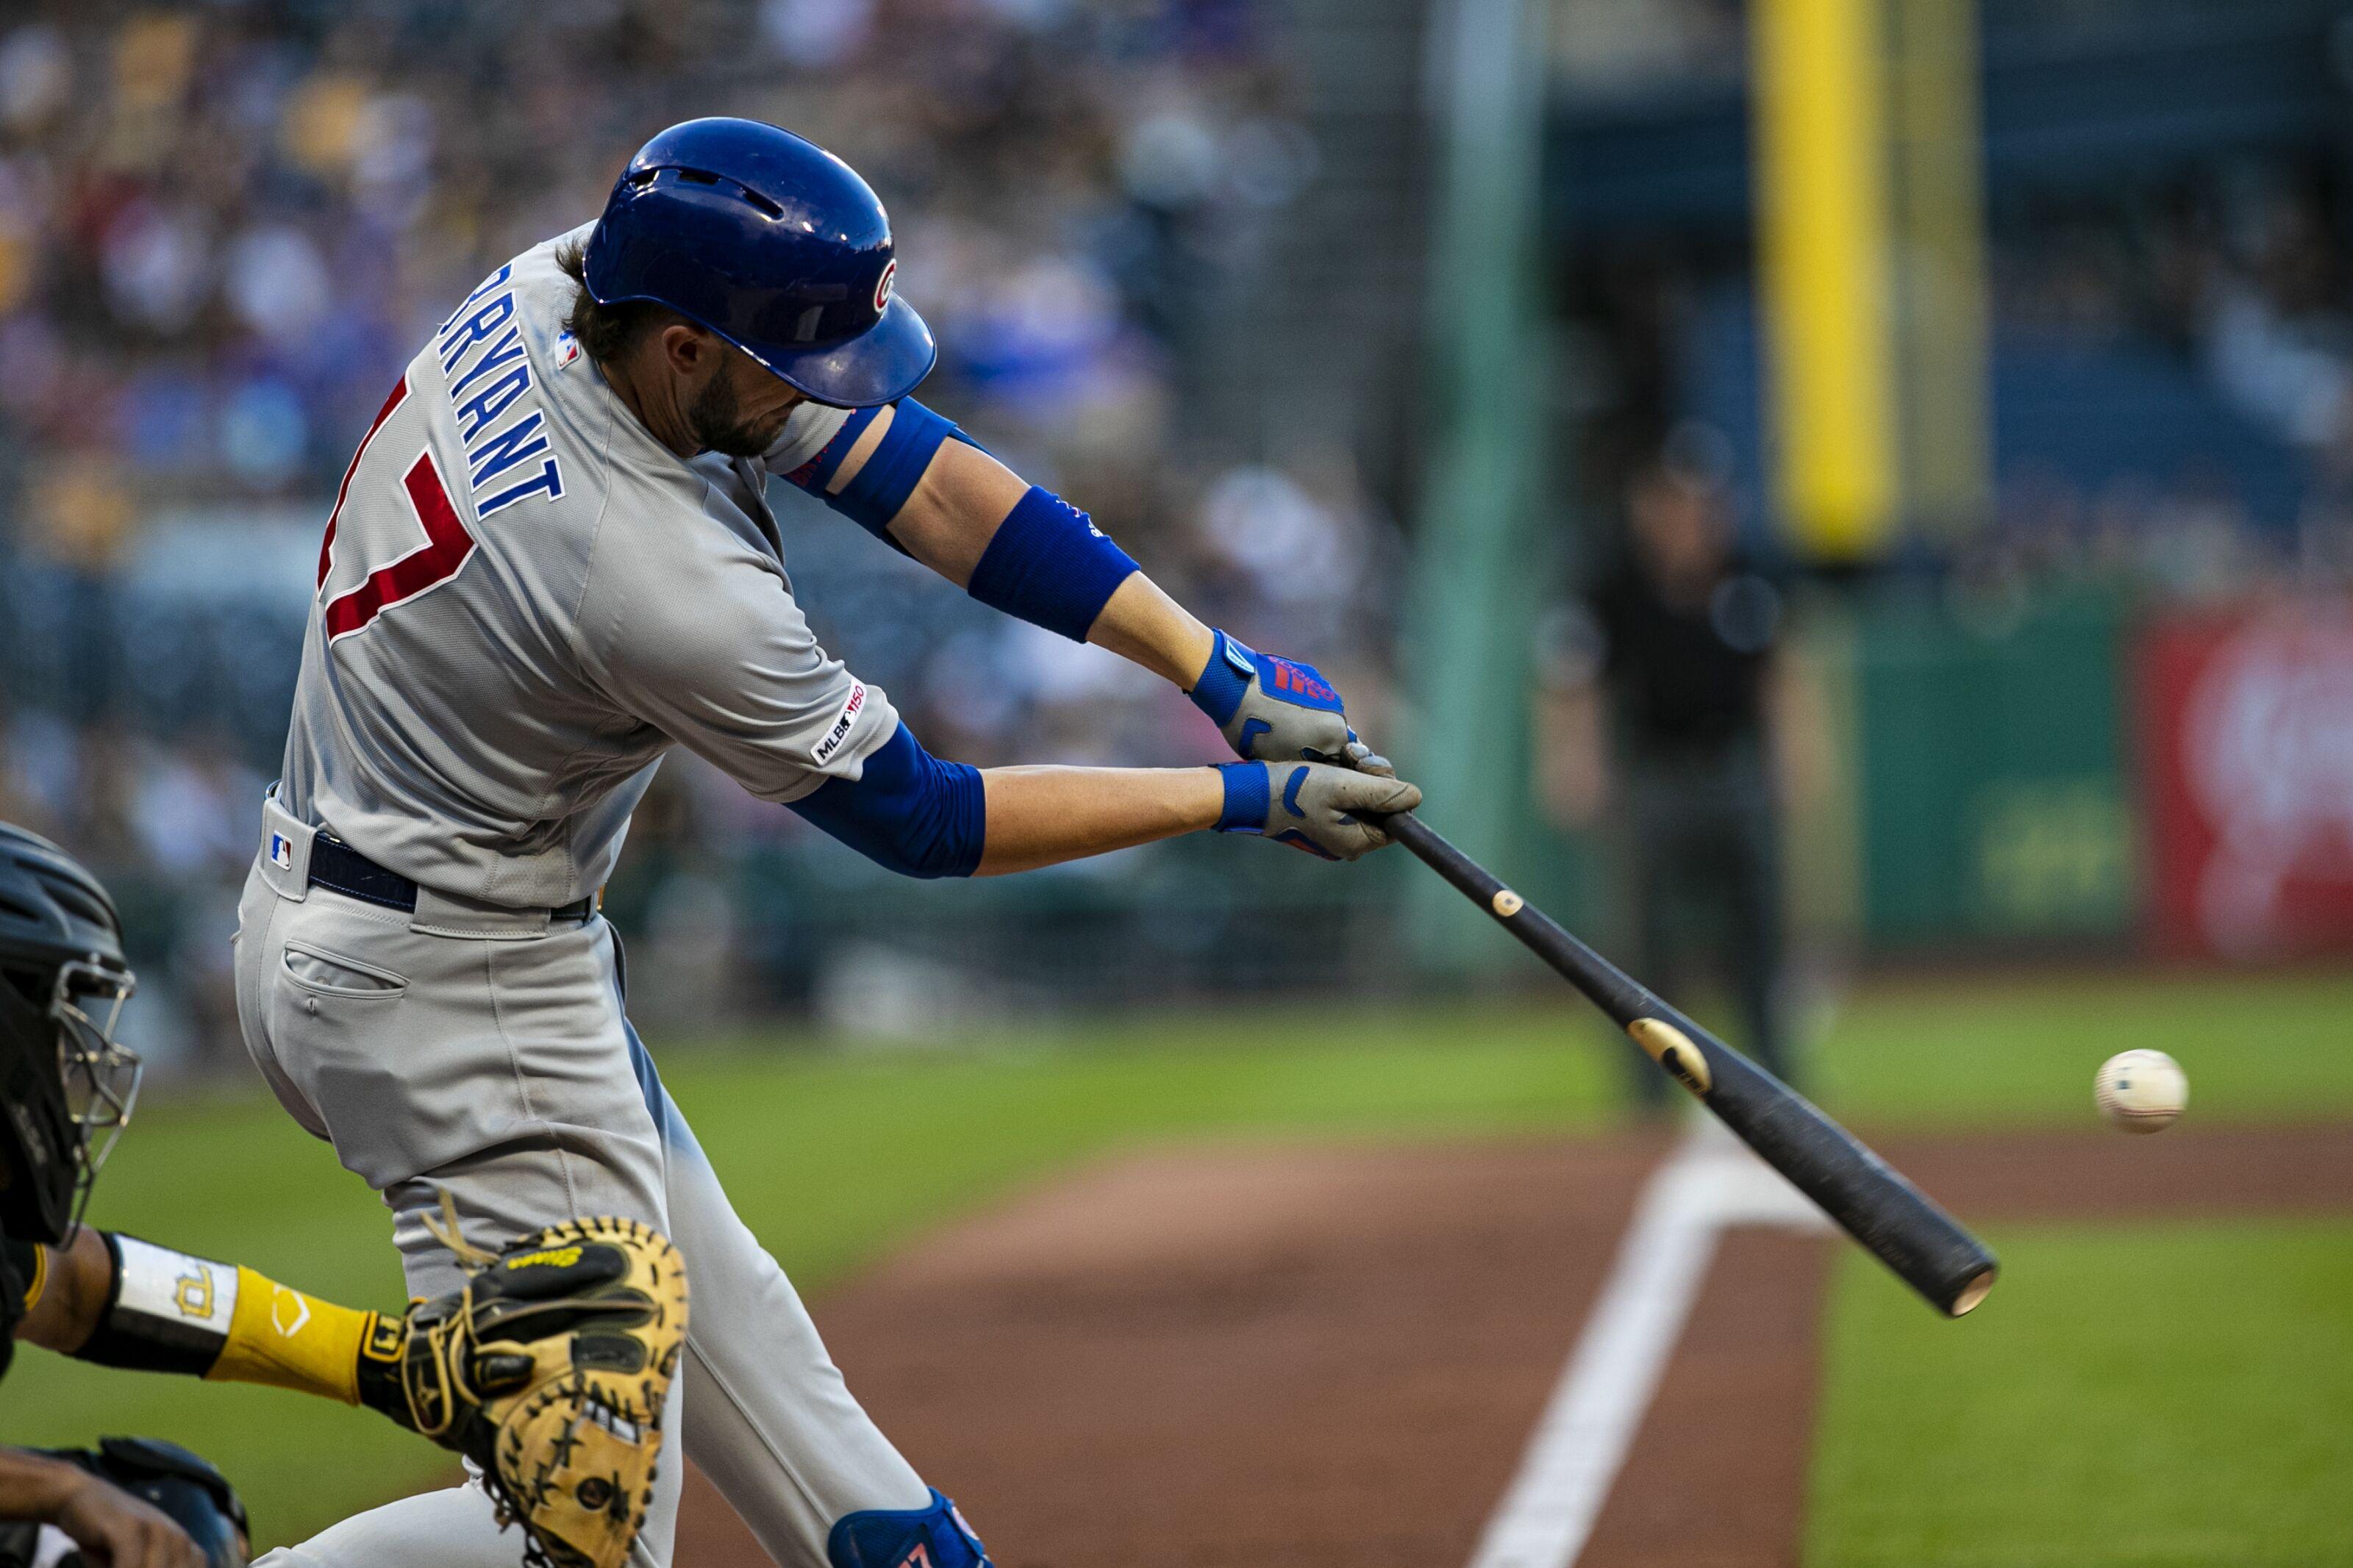 2019 MLB Season: Is MLB beefing up the baseballs?